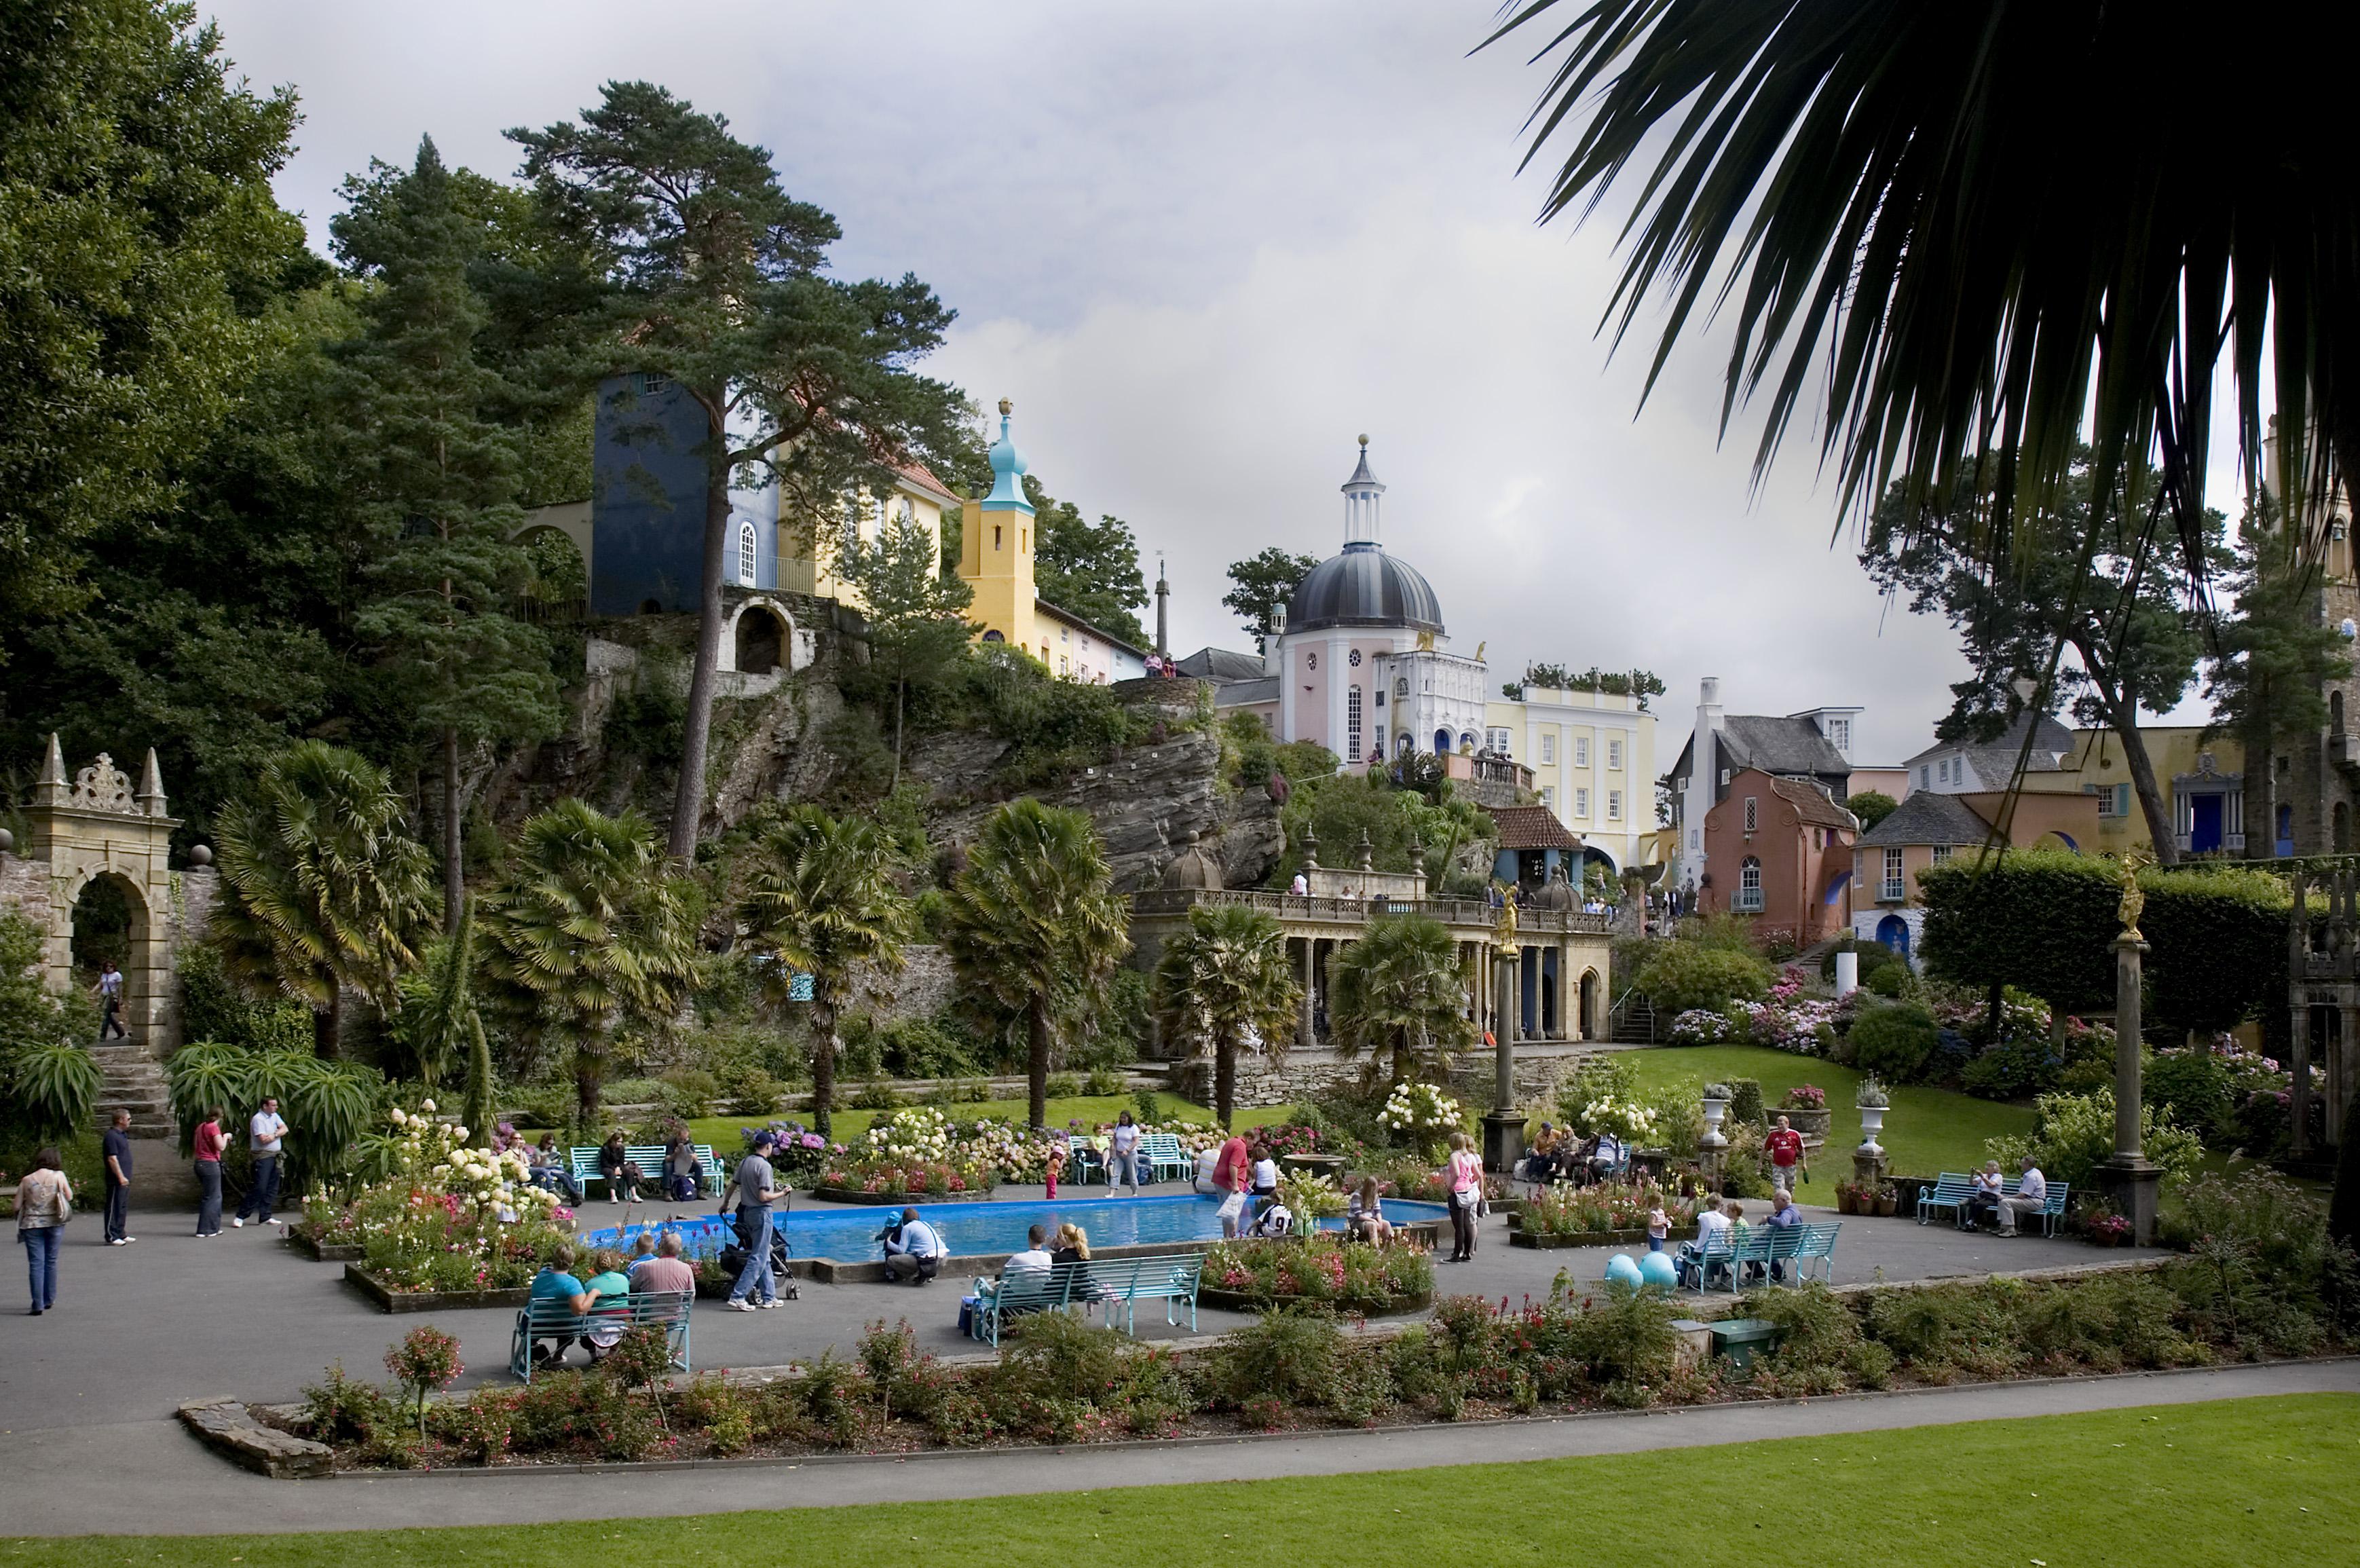 Portmeirion Walk Oakeley Arms Hotel Castell Deudraeth Wales Gazeboholiday Hotelnorth